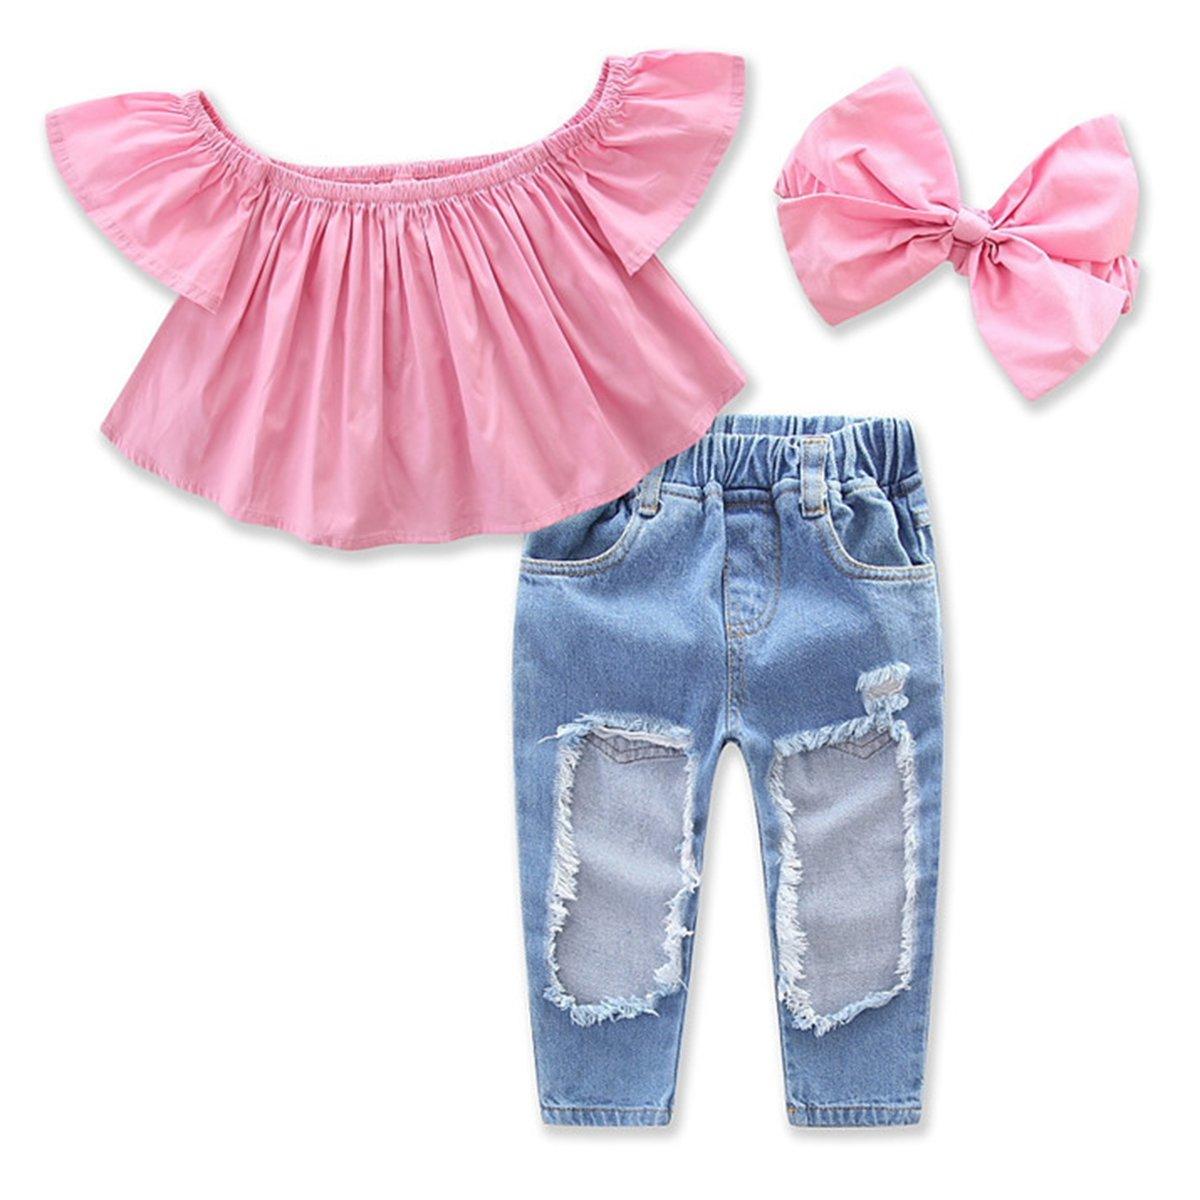 76b2617451e3f 1-7Yrs Kid Baby Girls Ruffle Tops + Big Hole Jeans Cool Girl Clothes  2pcs/Set